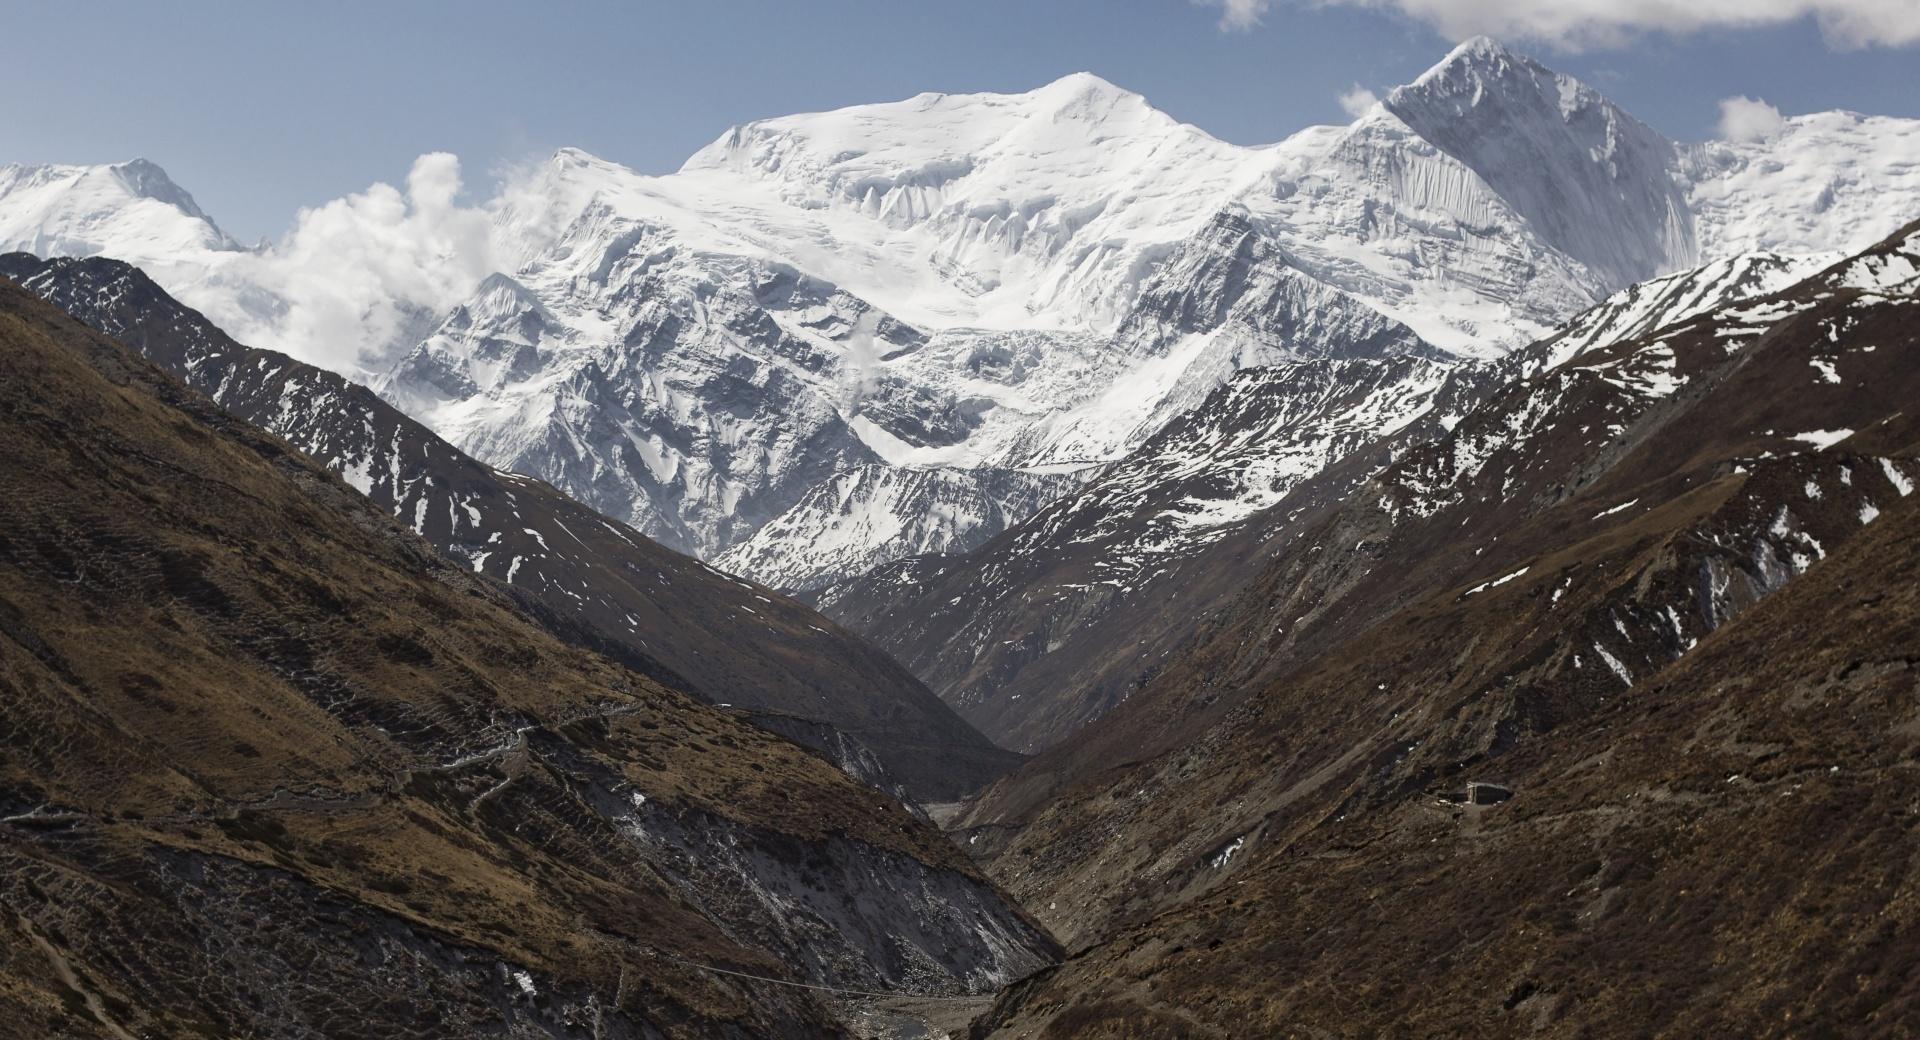 Annapurna Range wallpapers HD quality